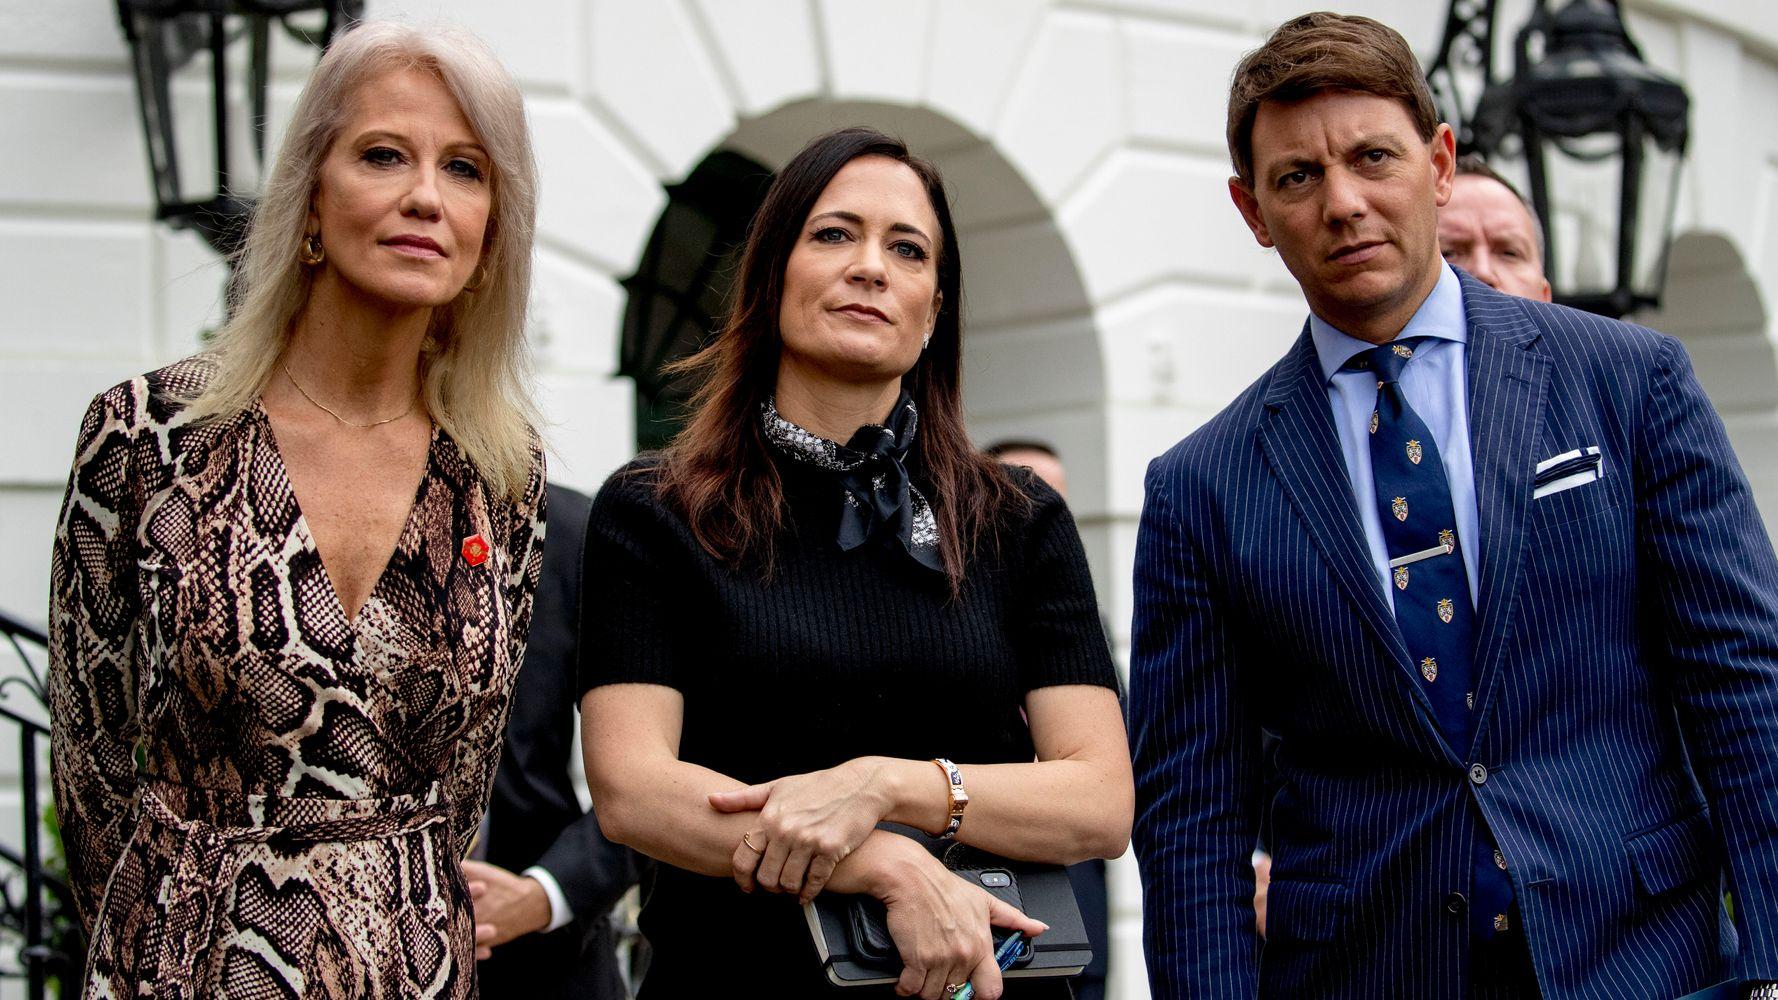 White House Aides Avoid Media Amid Impeachment Storm